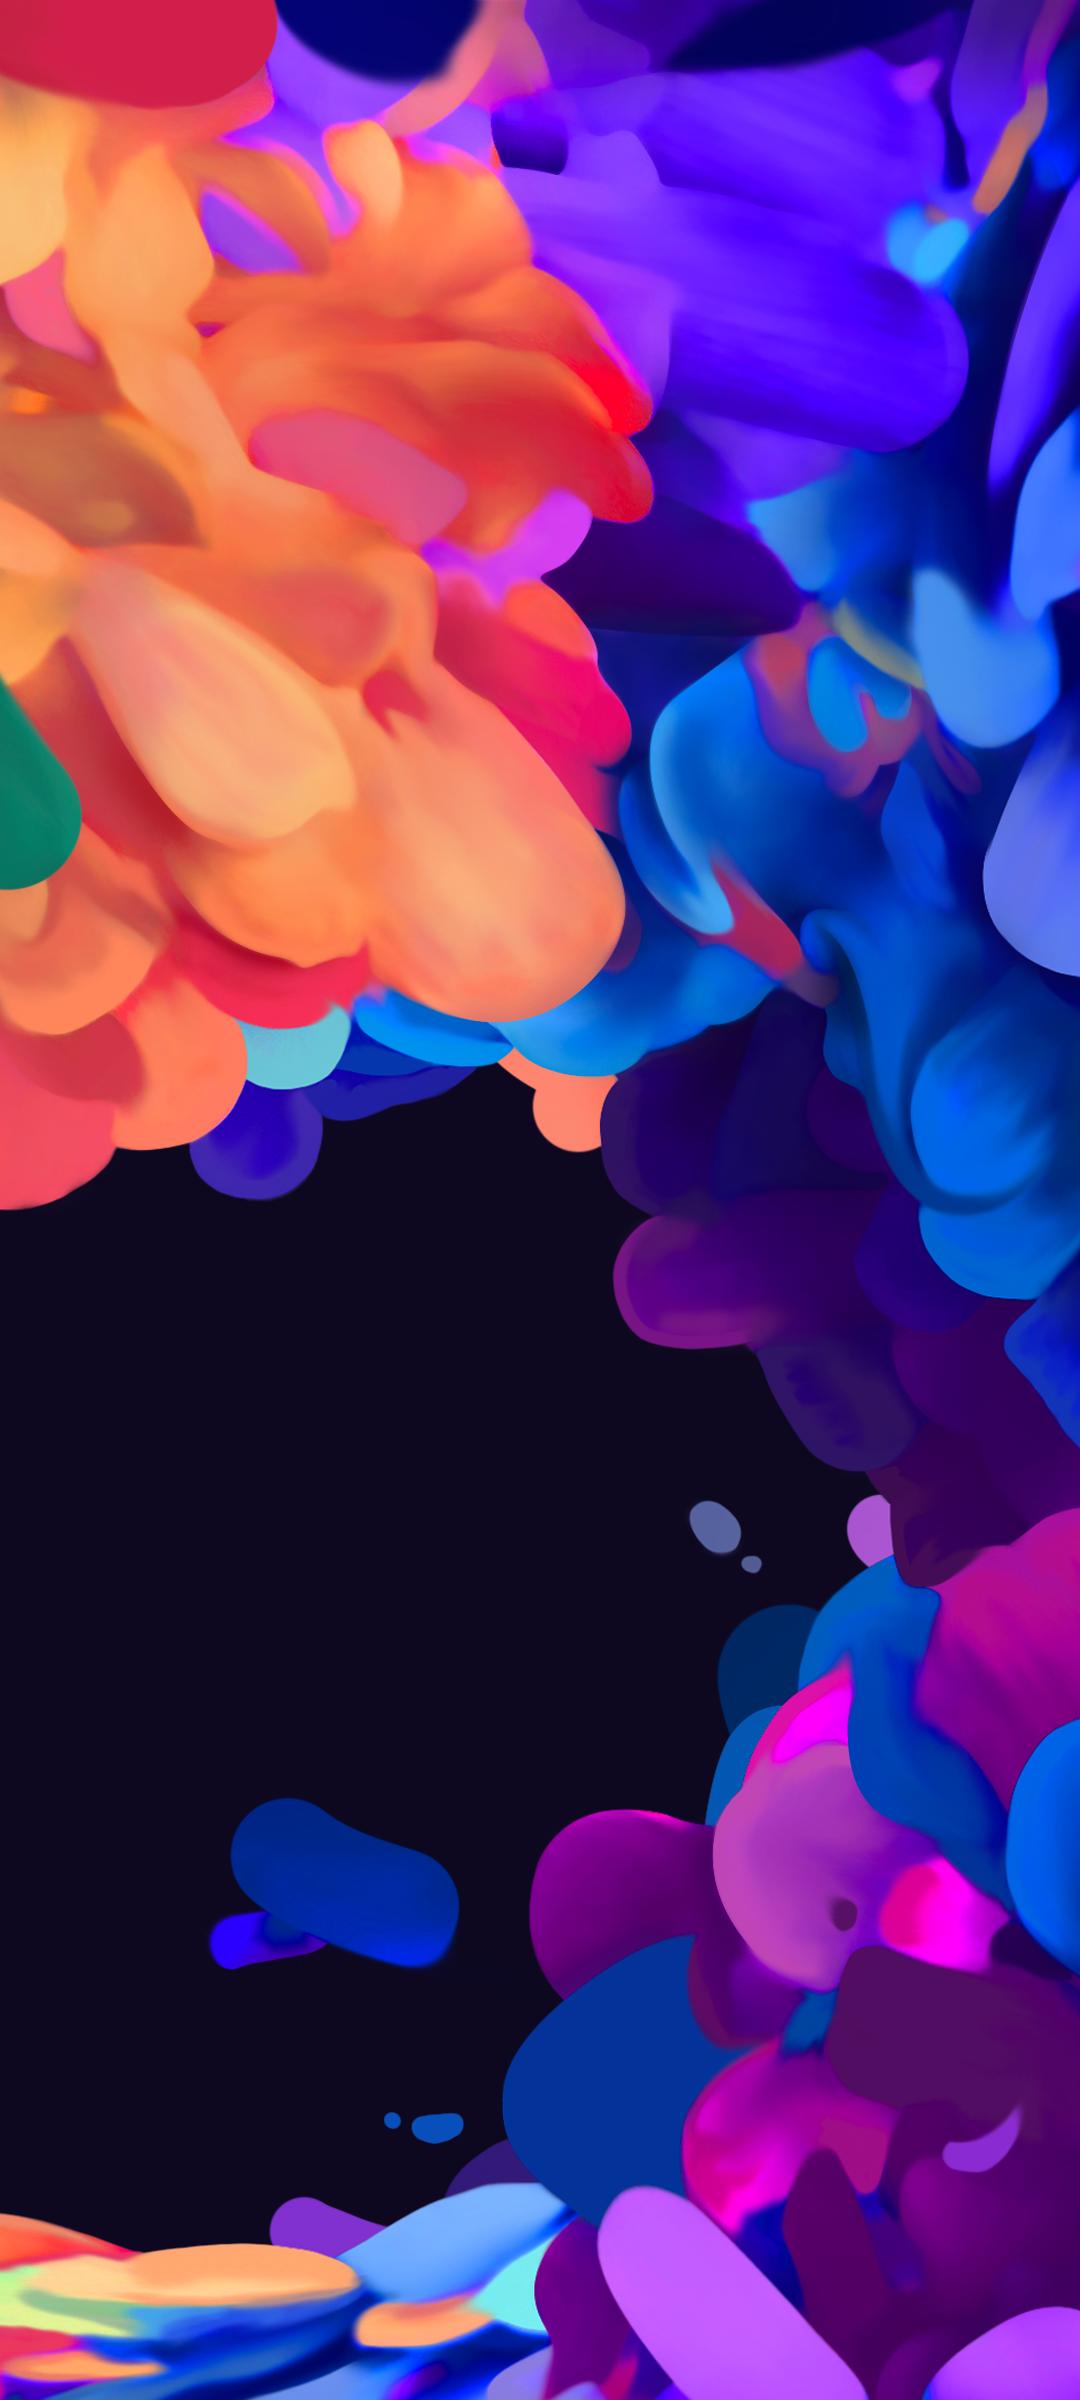 Samsung Galaxy S20 Fe Wallpaper Ytechb In 2020 Mkbhd Wallpapers Stock Wallpaper Colorful Wallpaper